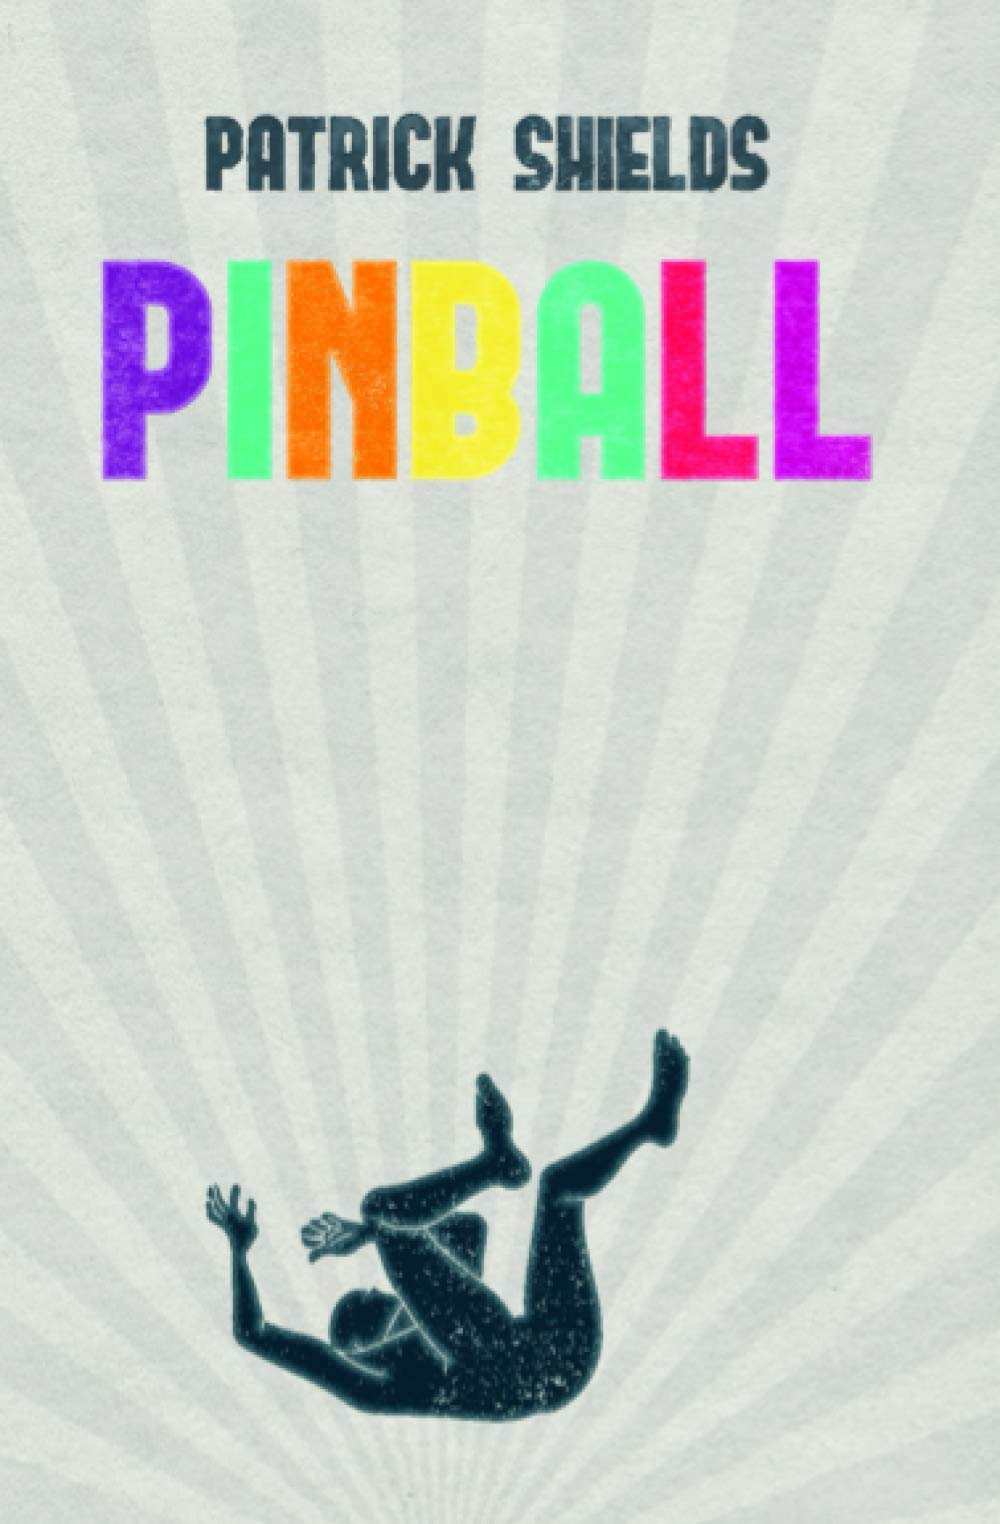 619hqz4H1eL - Pinball